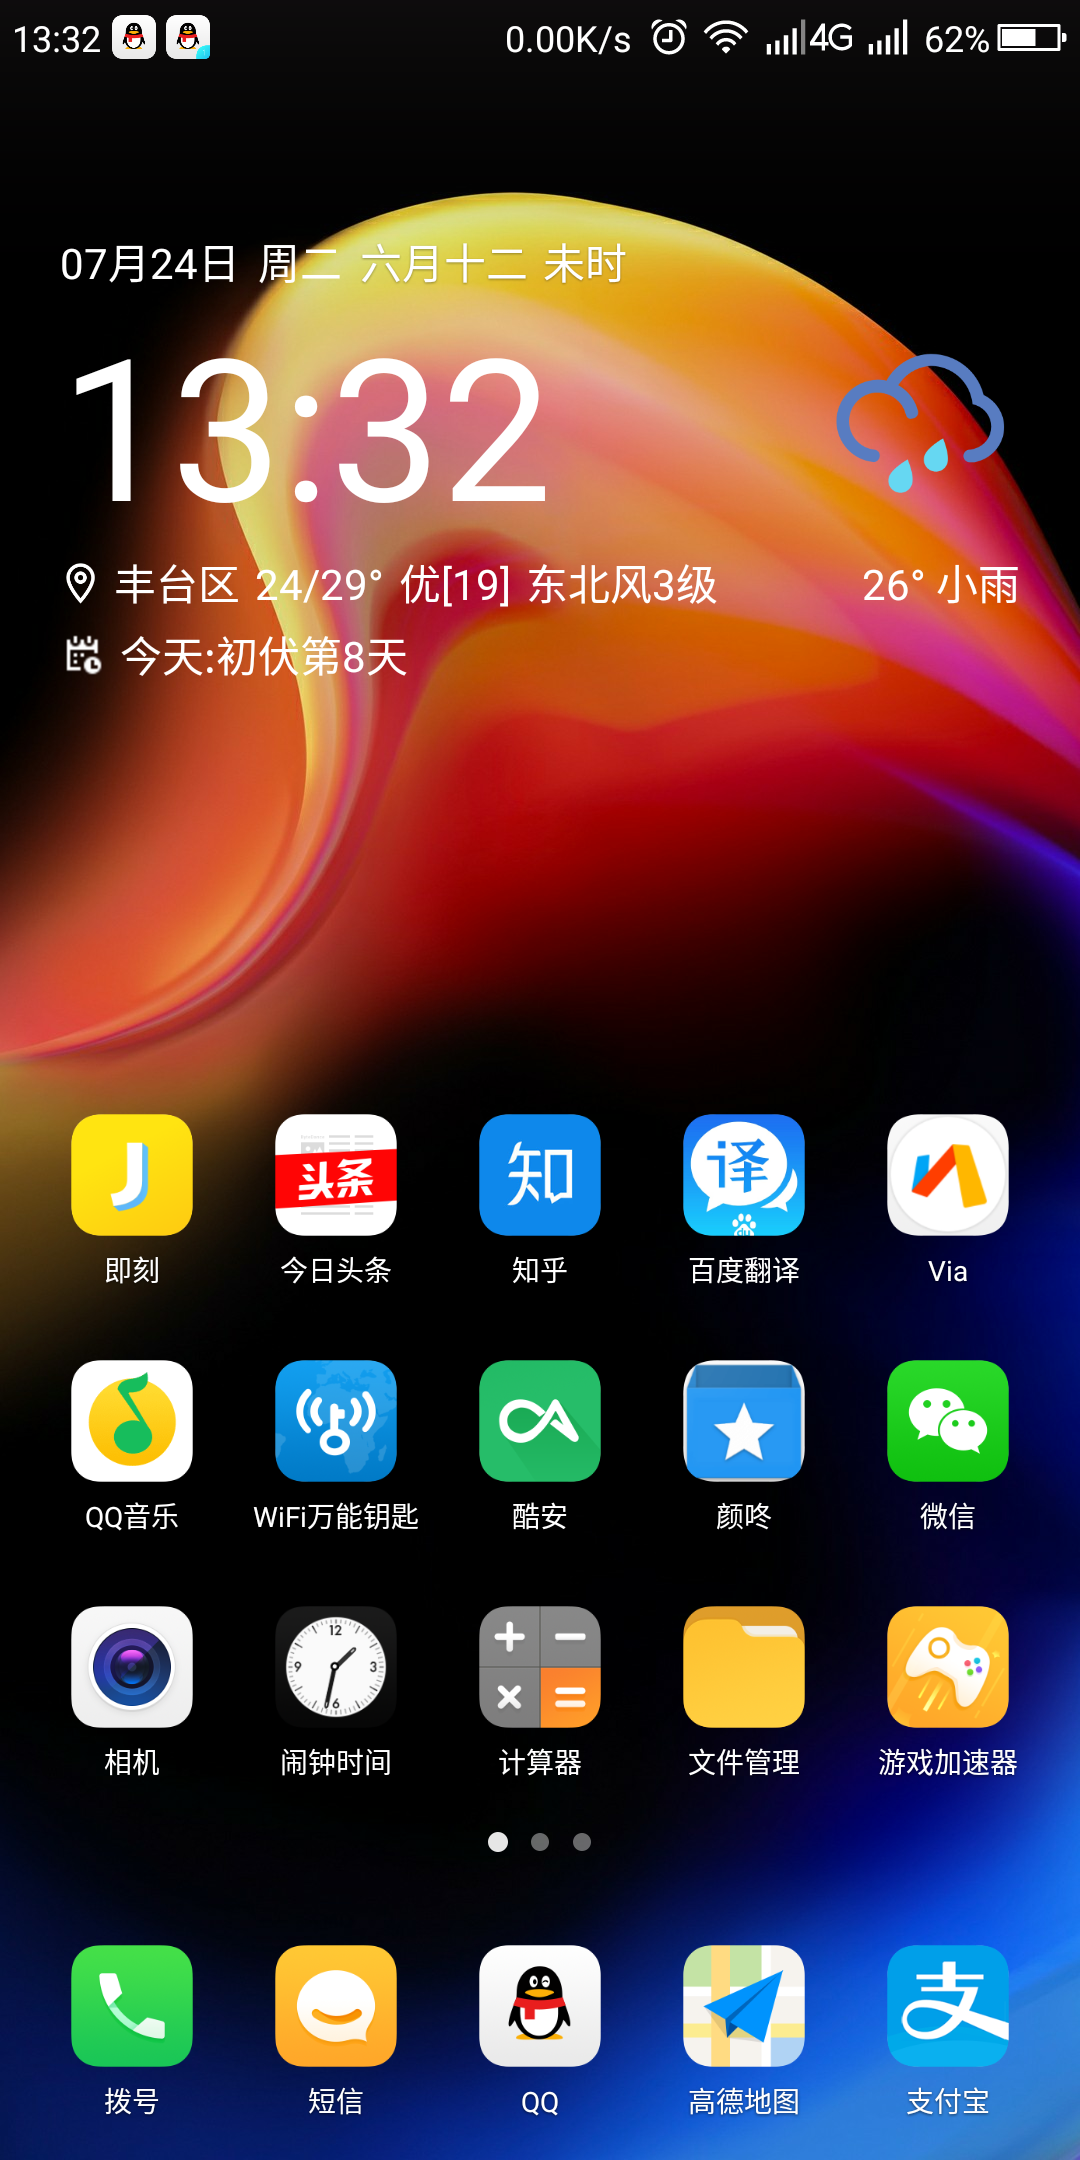 Screenshot_2018-07-24-13-32-51.png